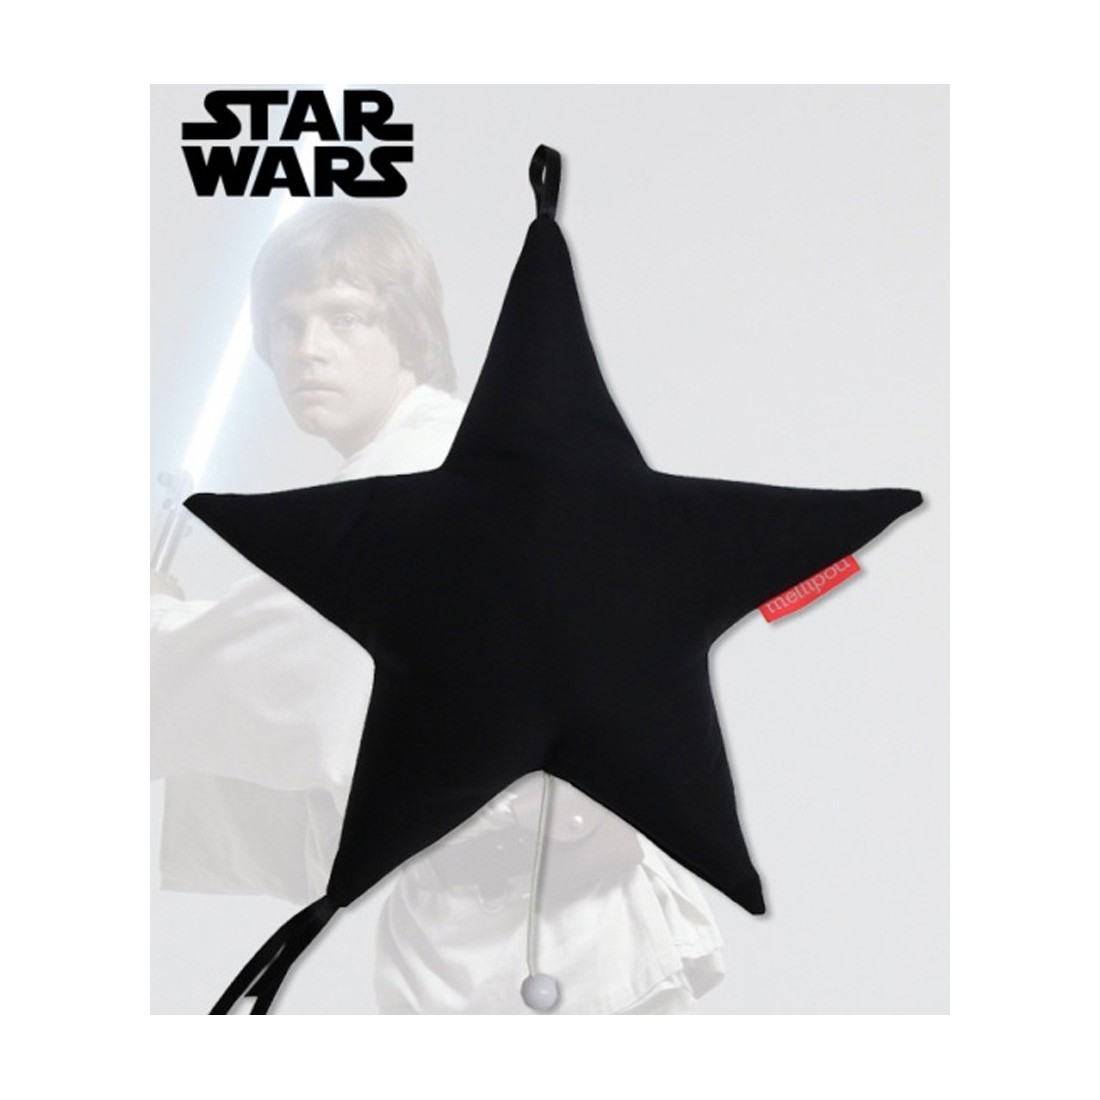 Boite à musique fun Star Wars